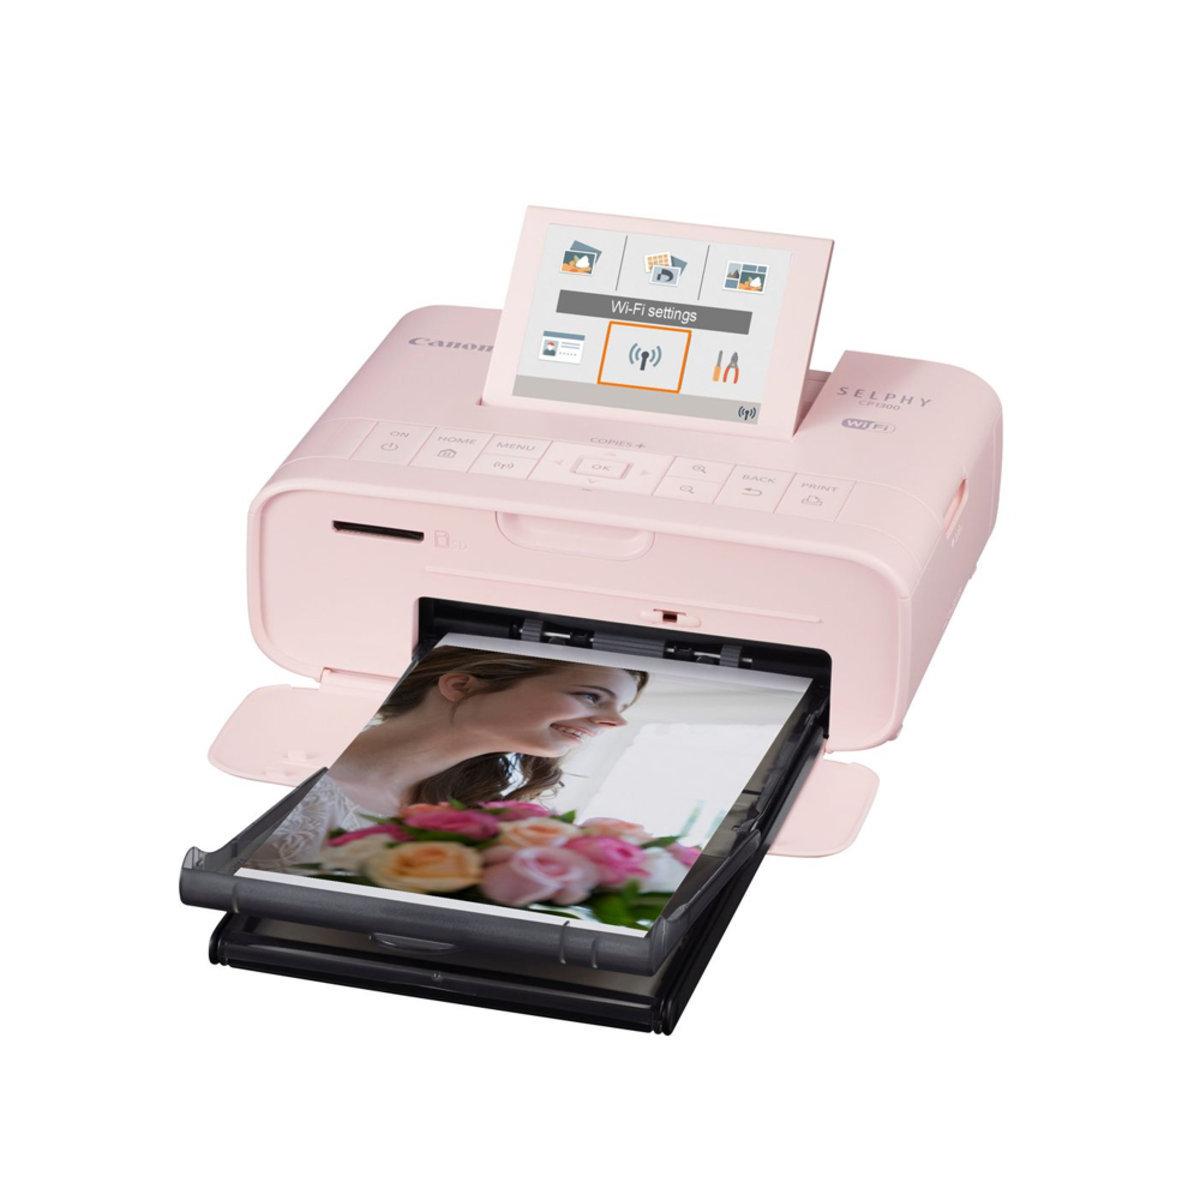 SELPHY CP1300 輕巧相片打印機 粉紅色 Canon